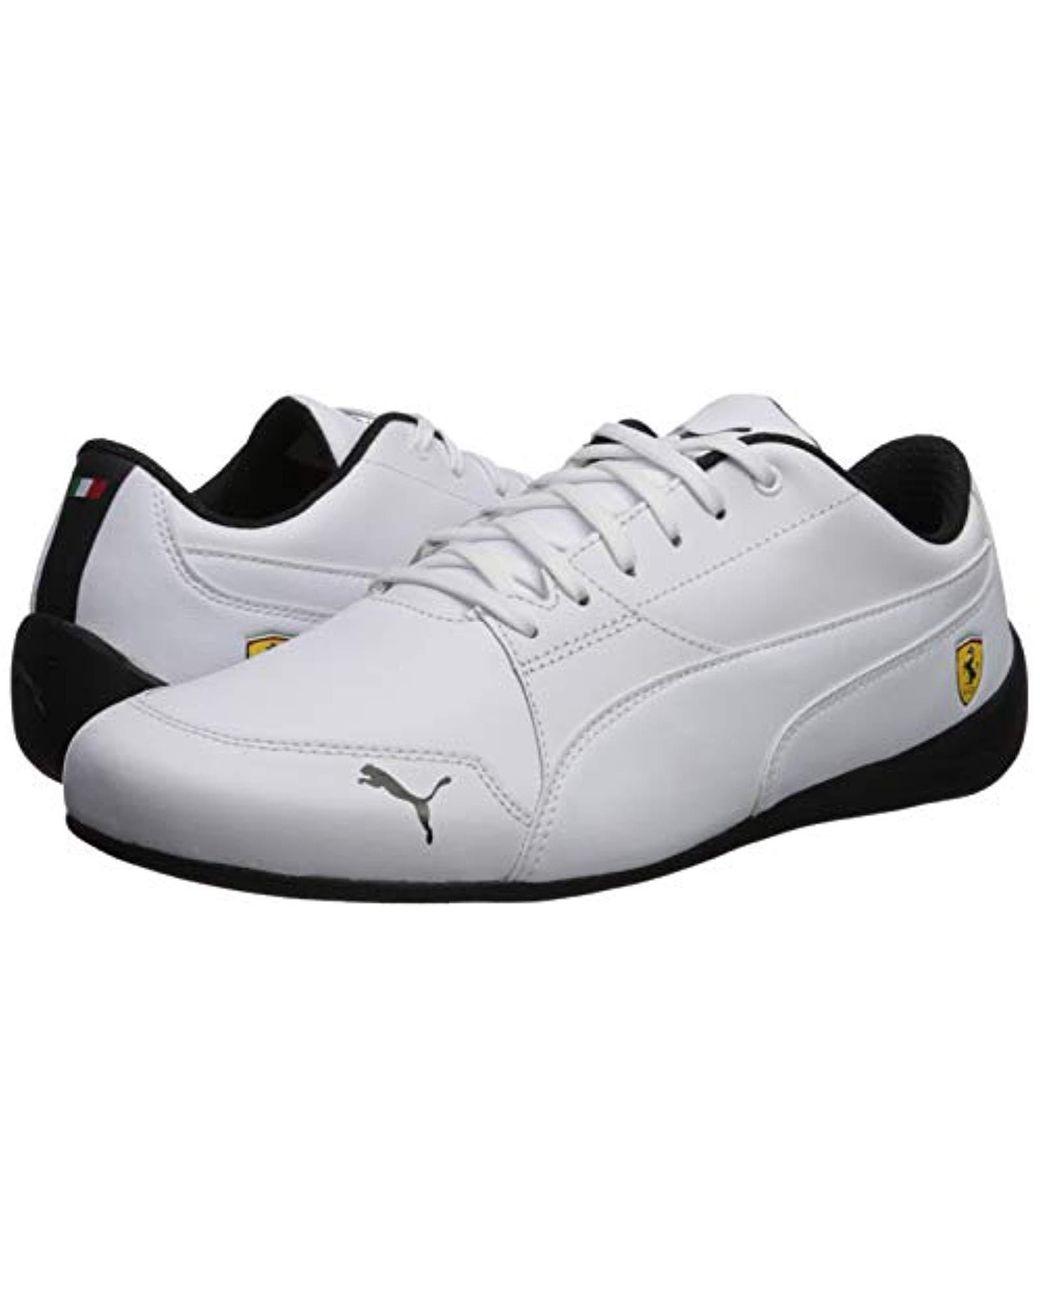 61e16d534cbcb Men's White Ferrari Drift Cat Sneaker